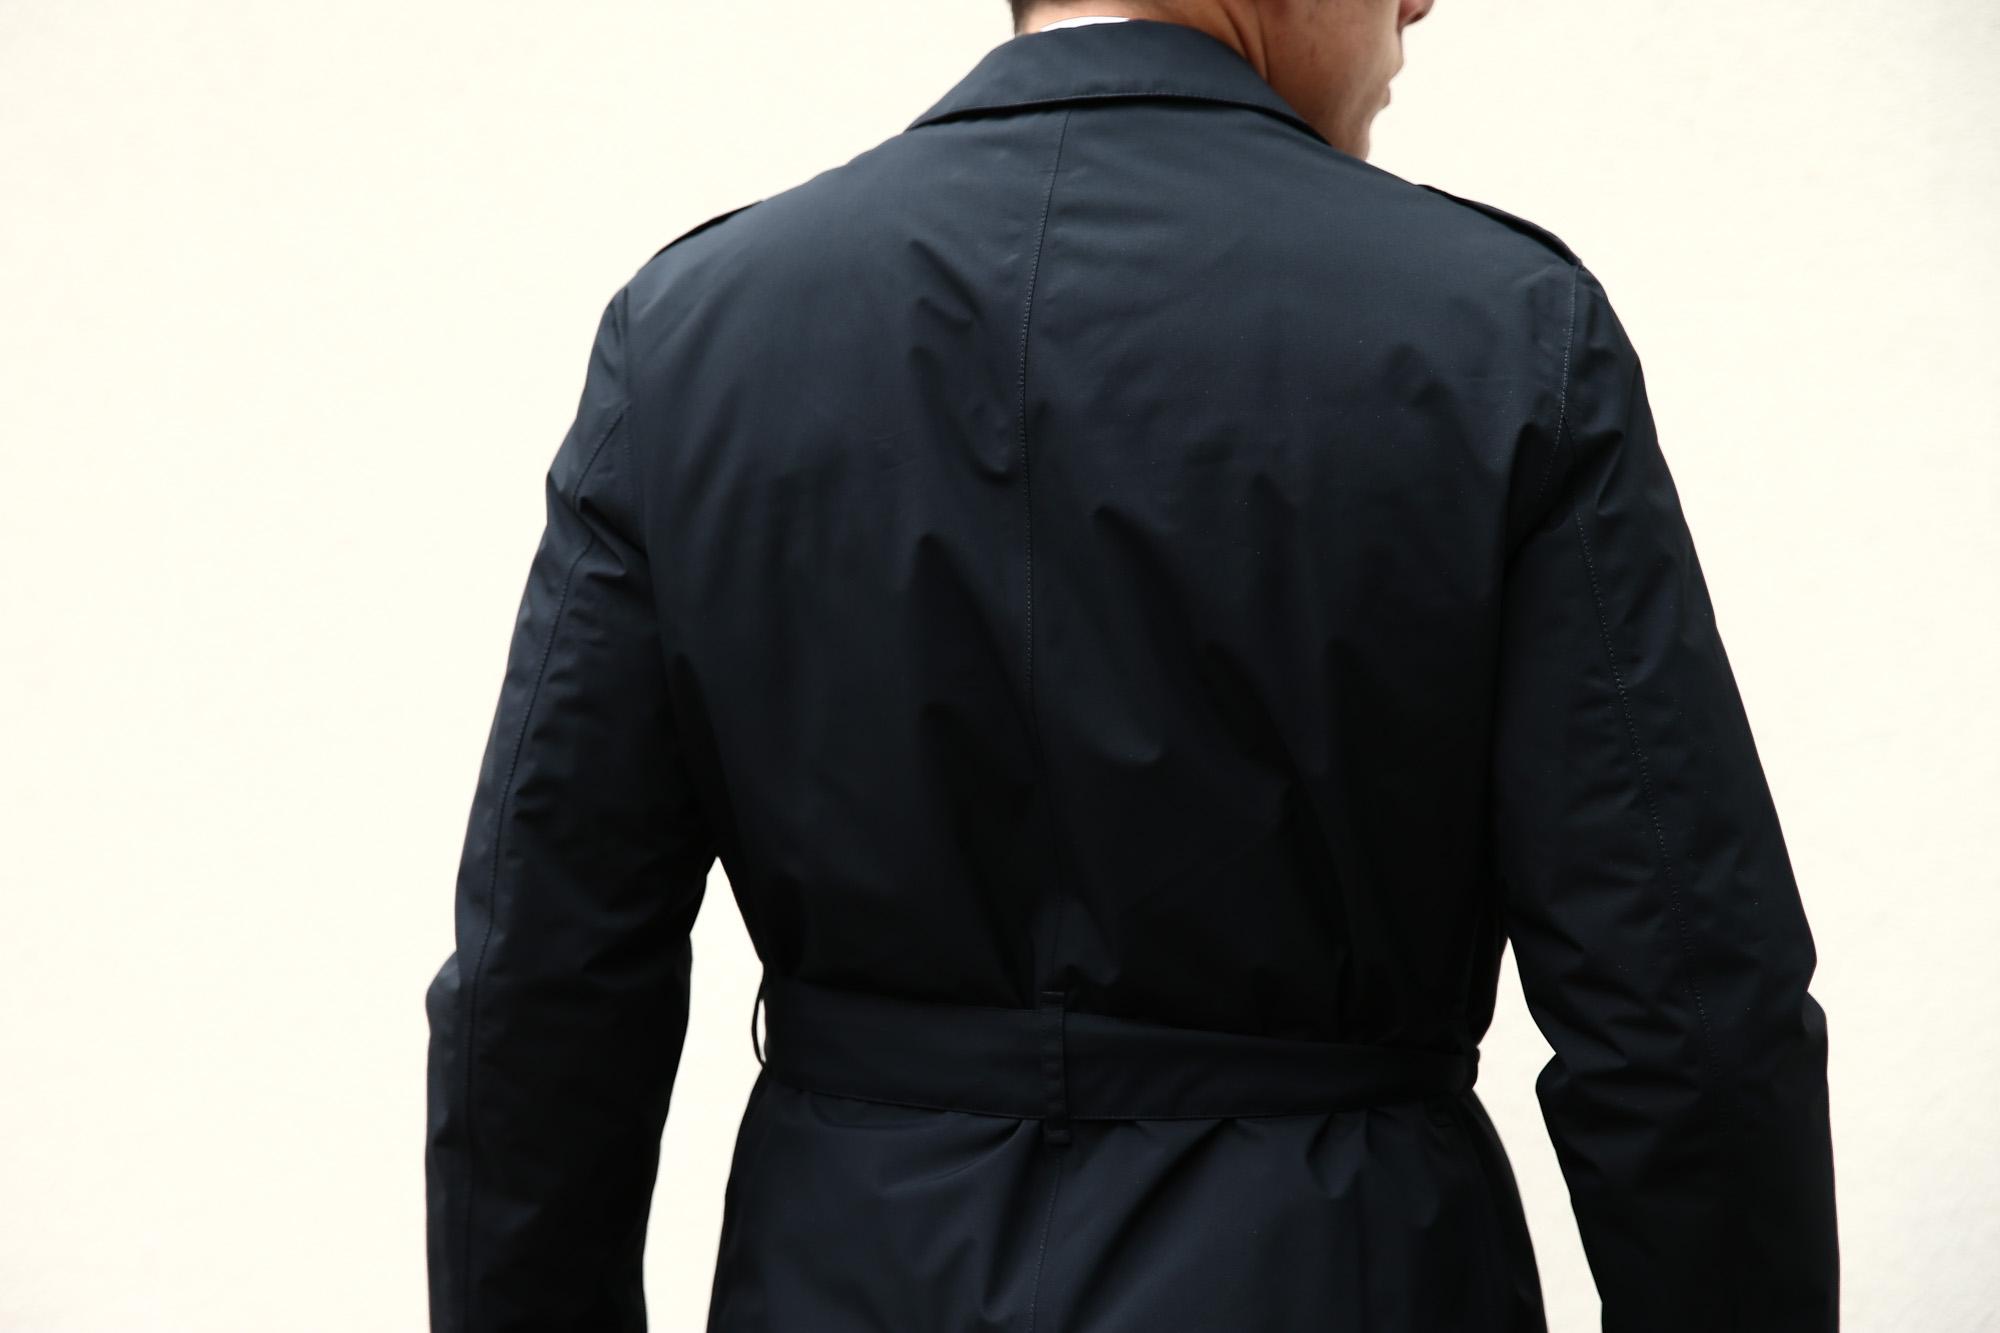 【HERNO / ヘルノ】 PI077UL LAMINAR Belted coat (ラミナー ベルテッドコート) GORE-TEX (ゴアテックス) 完全防水 ステンカラー シングル ベルテッドコート BLACK (ブラック・9300) 2017 秋冬新作 愛知 名古屋 herno ヘルノ ダウンコート 42,44,46,48,50,52,54